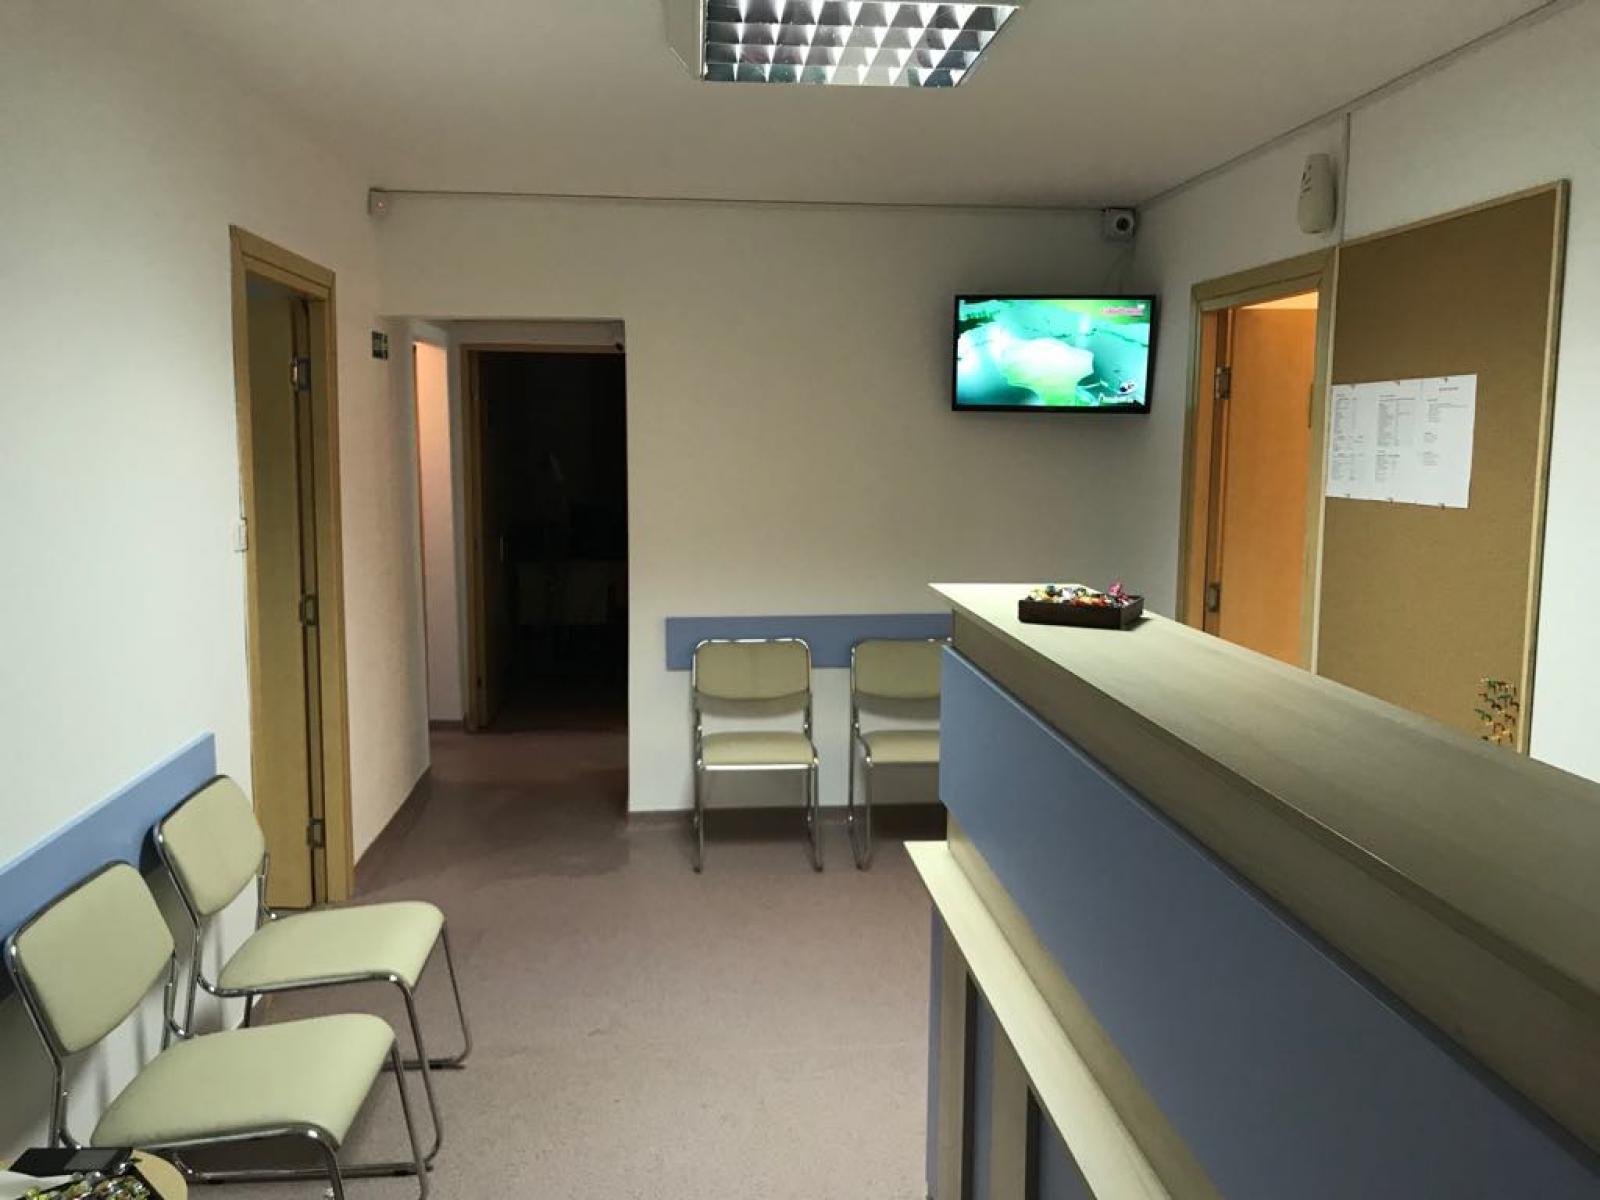 Centrul Medical Profilaxia - 26854852_2014808125212318_282182743_o.jpg